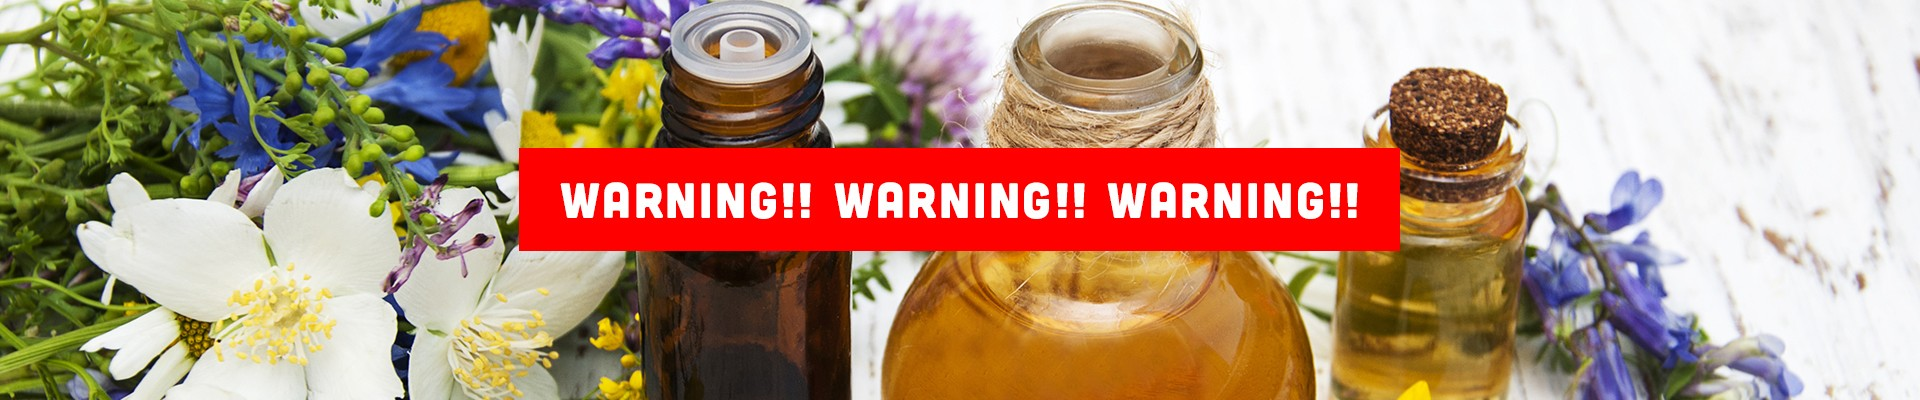 warning-warning-warning-essential-oils